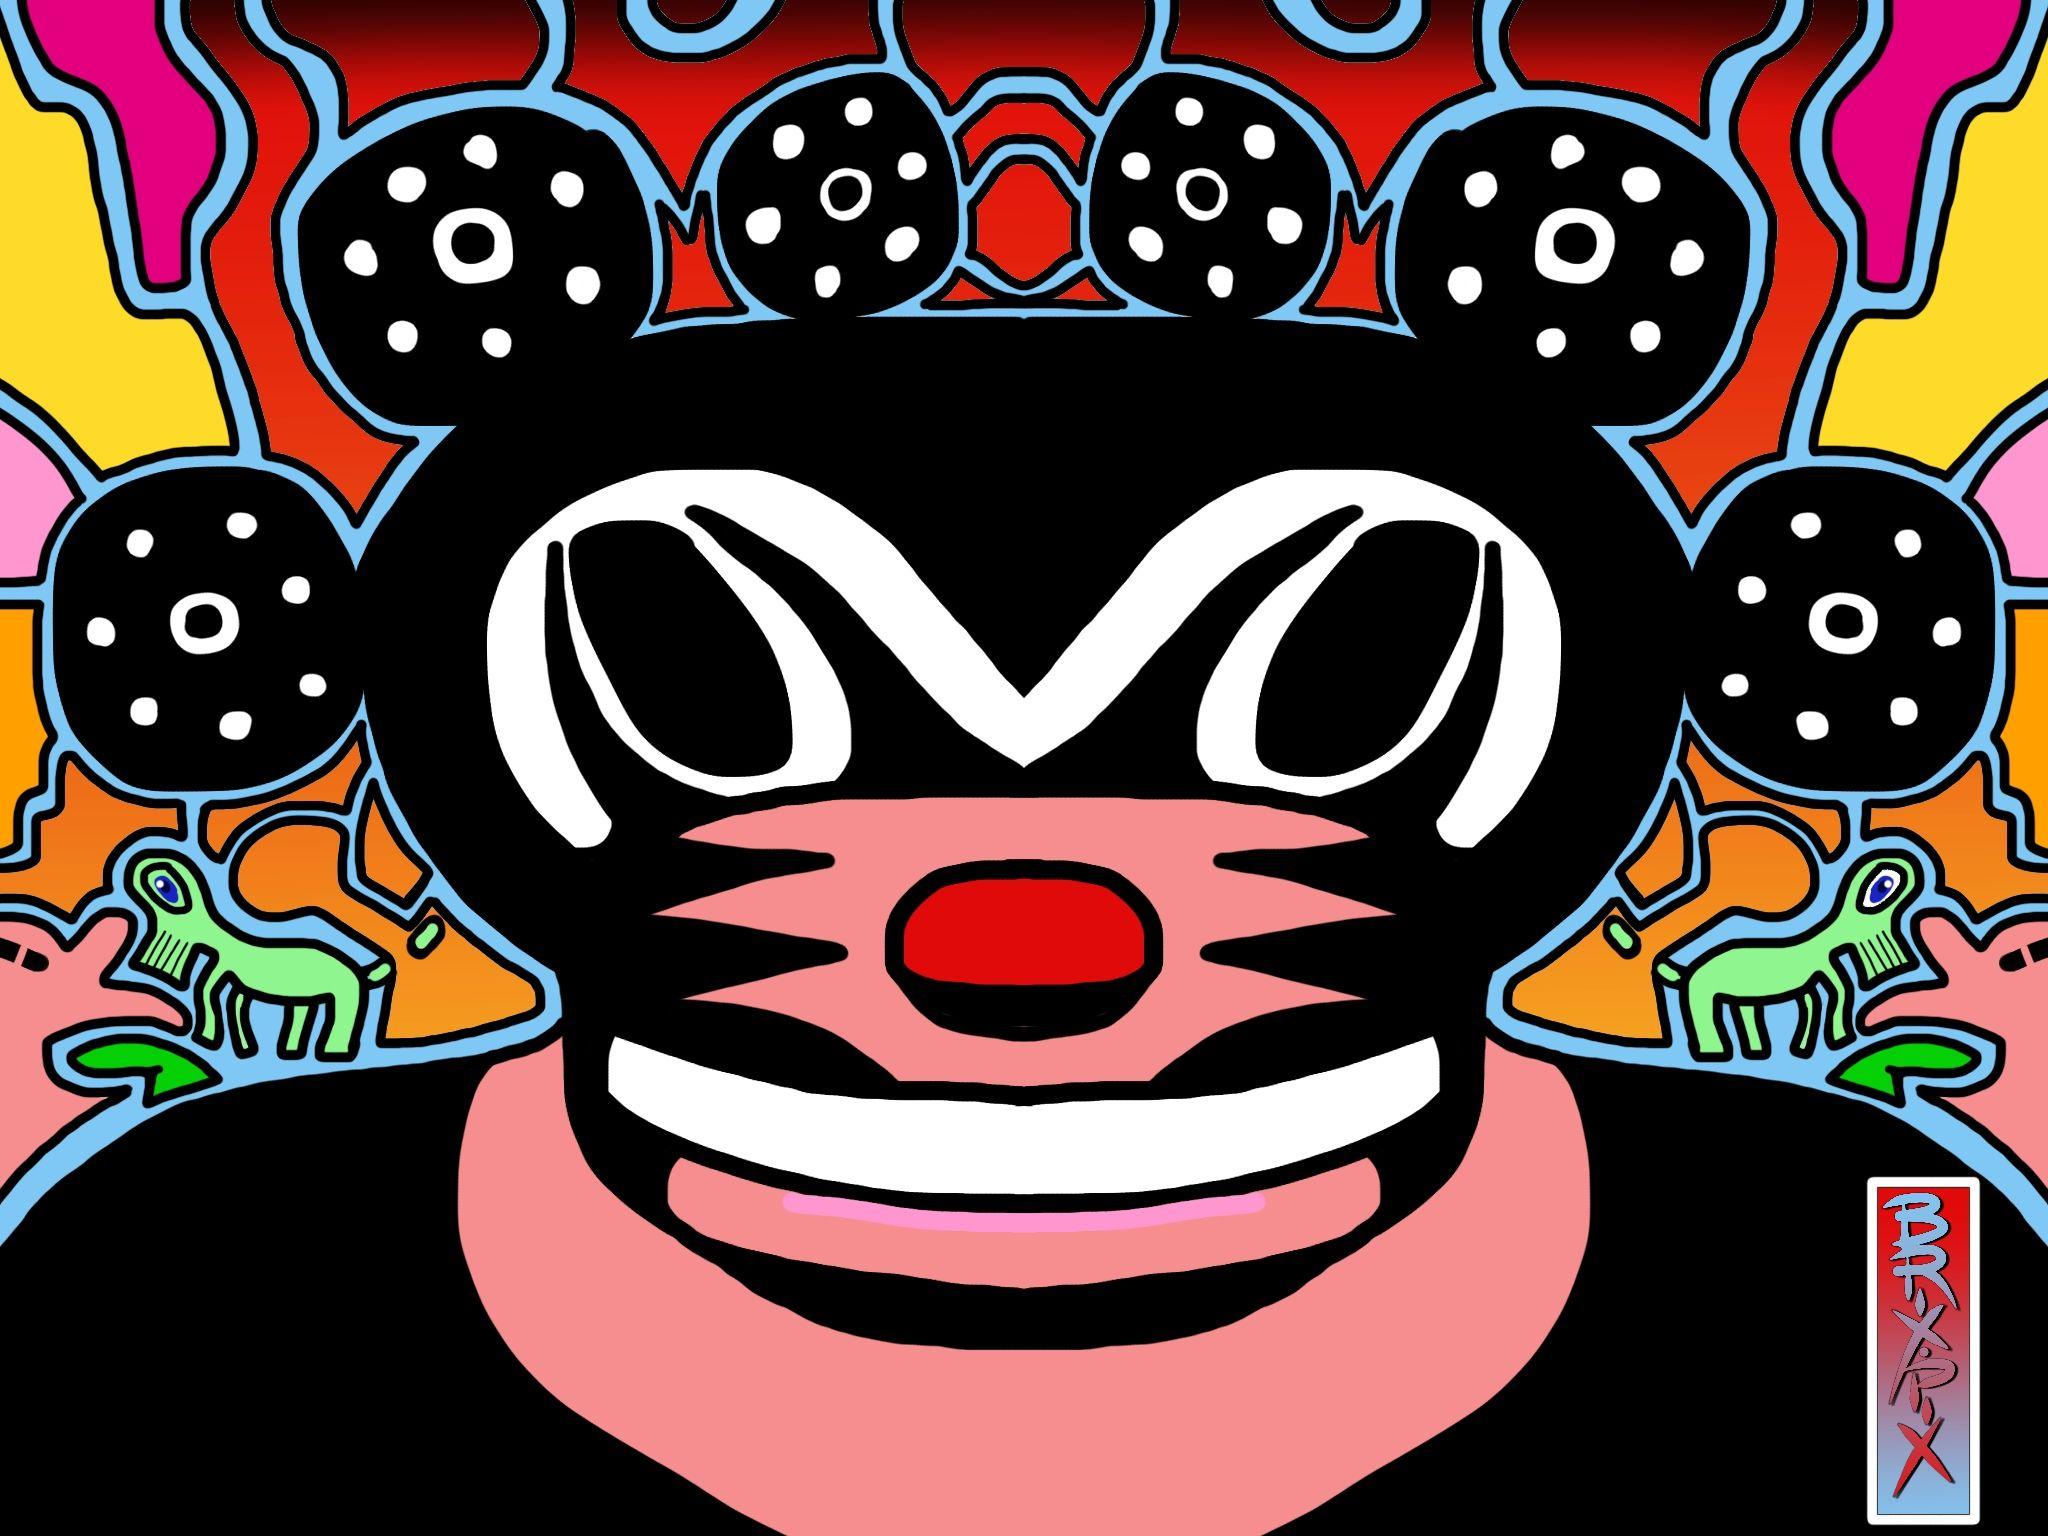 Lucha Libre | Disney characters, Character, Digital art